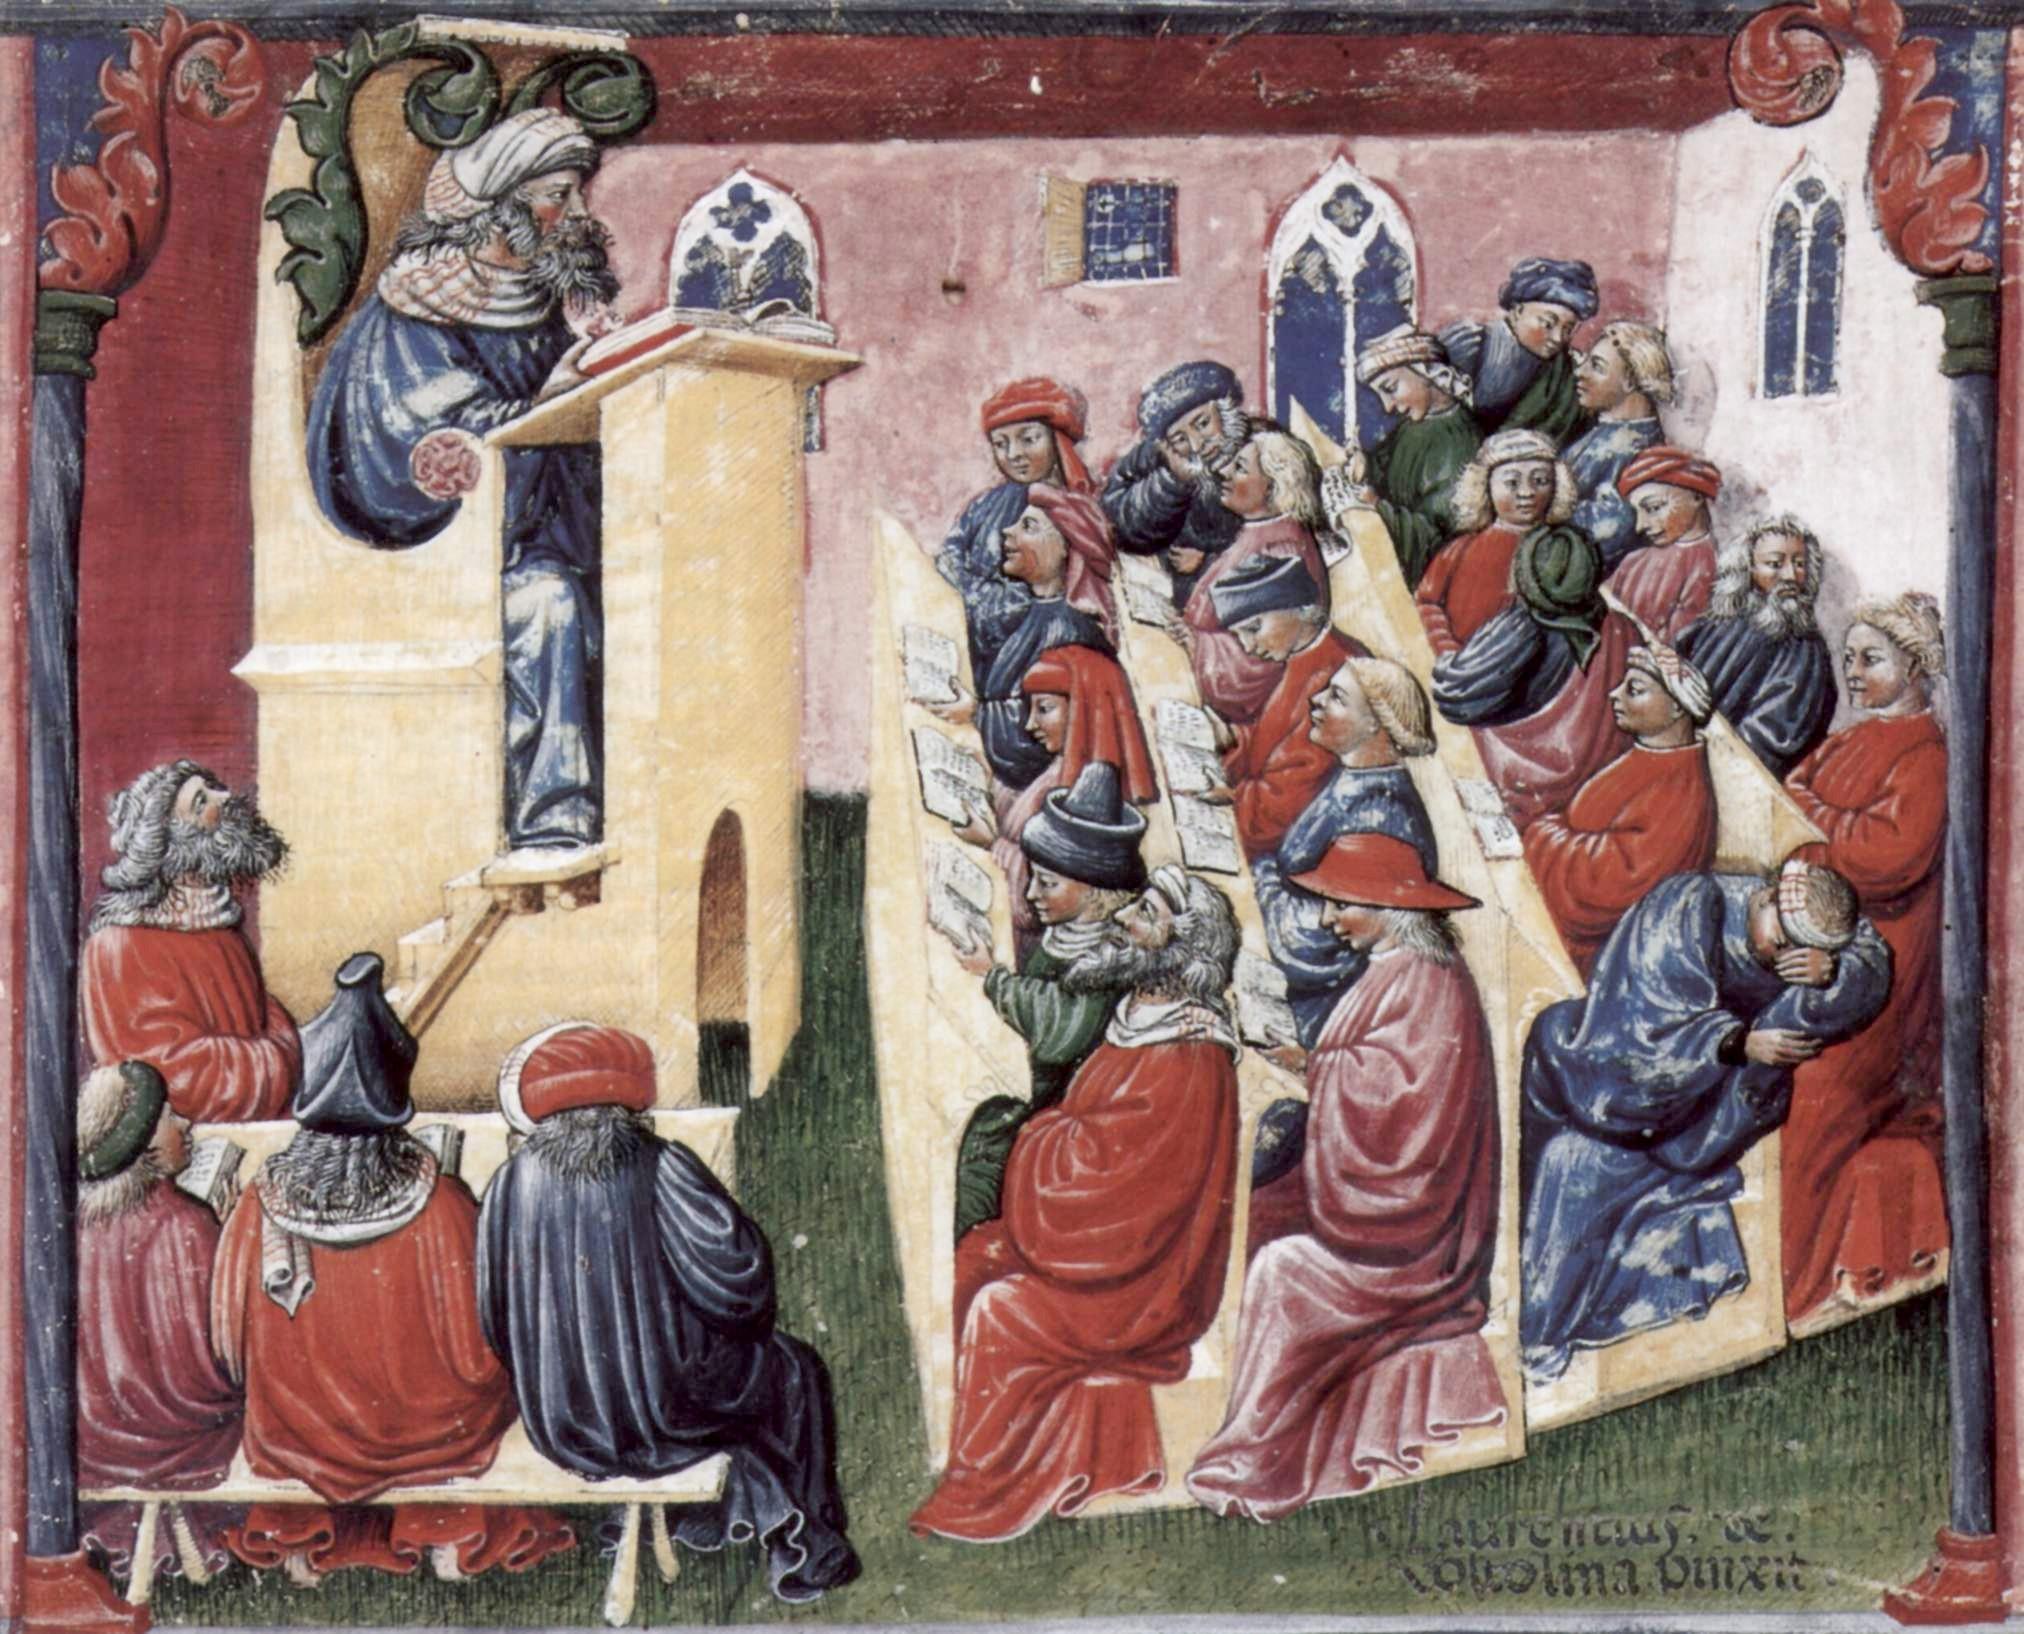 Class at the University around 1350.